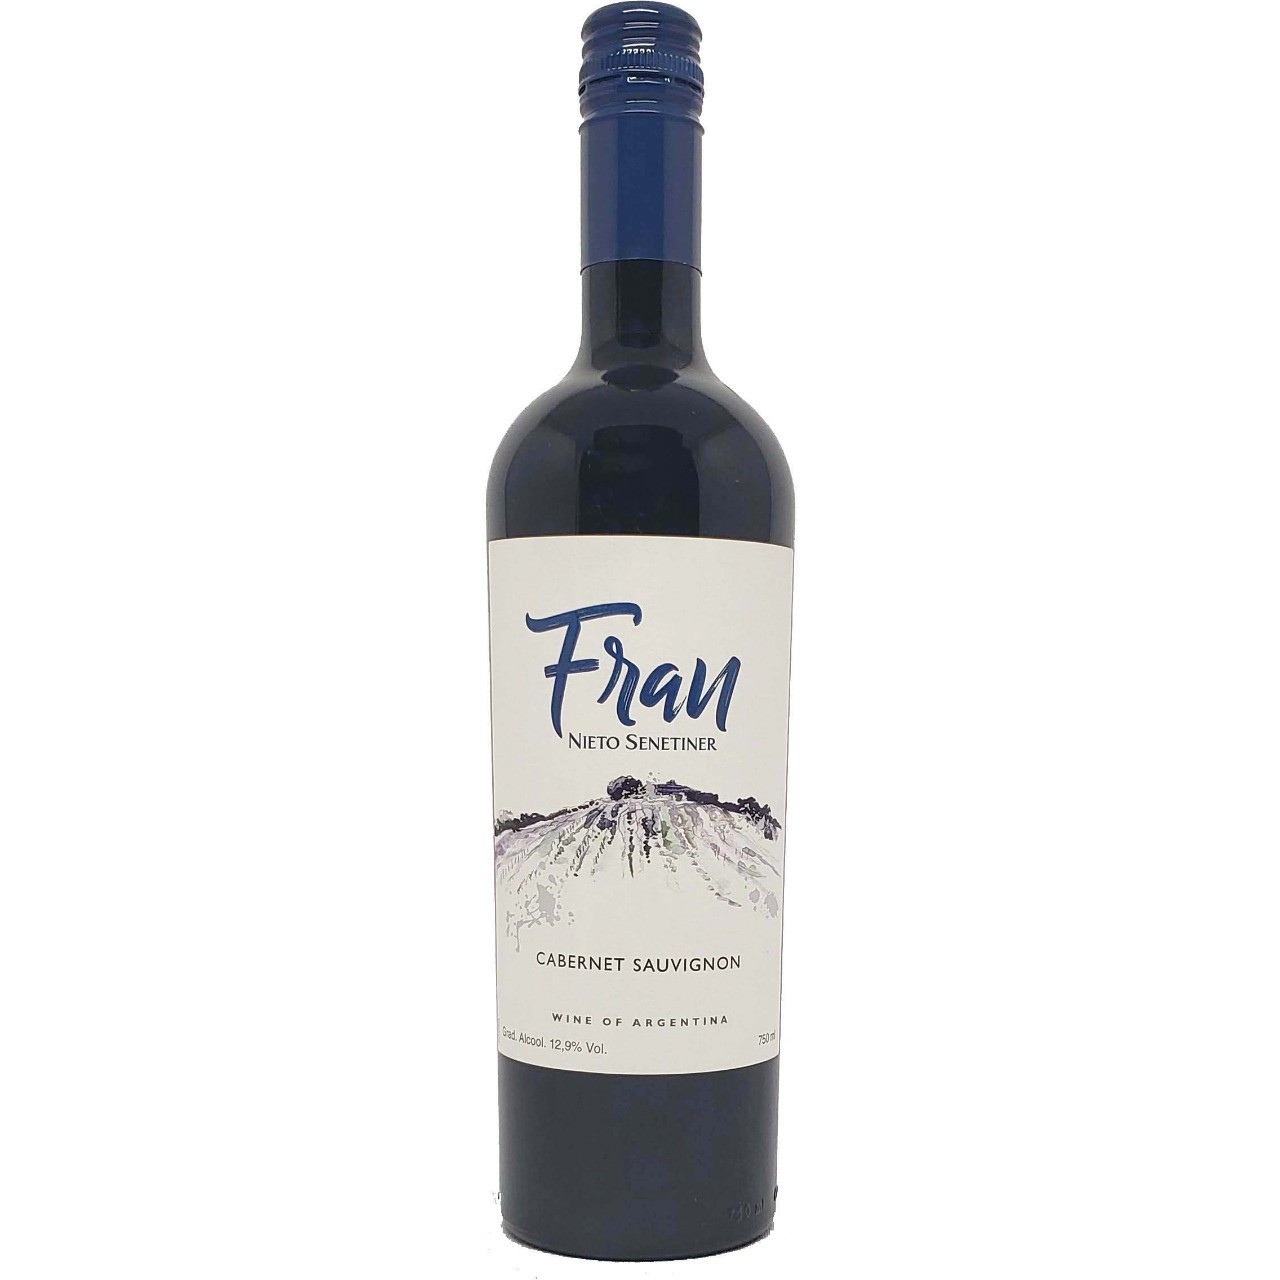 Vinho Tinto Fran Nieto Senetiner Cabernet Sauvignon - 750ml -